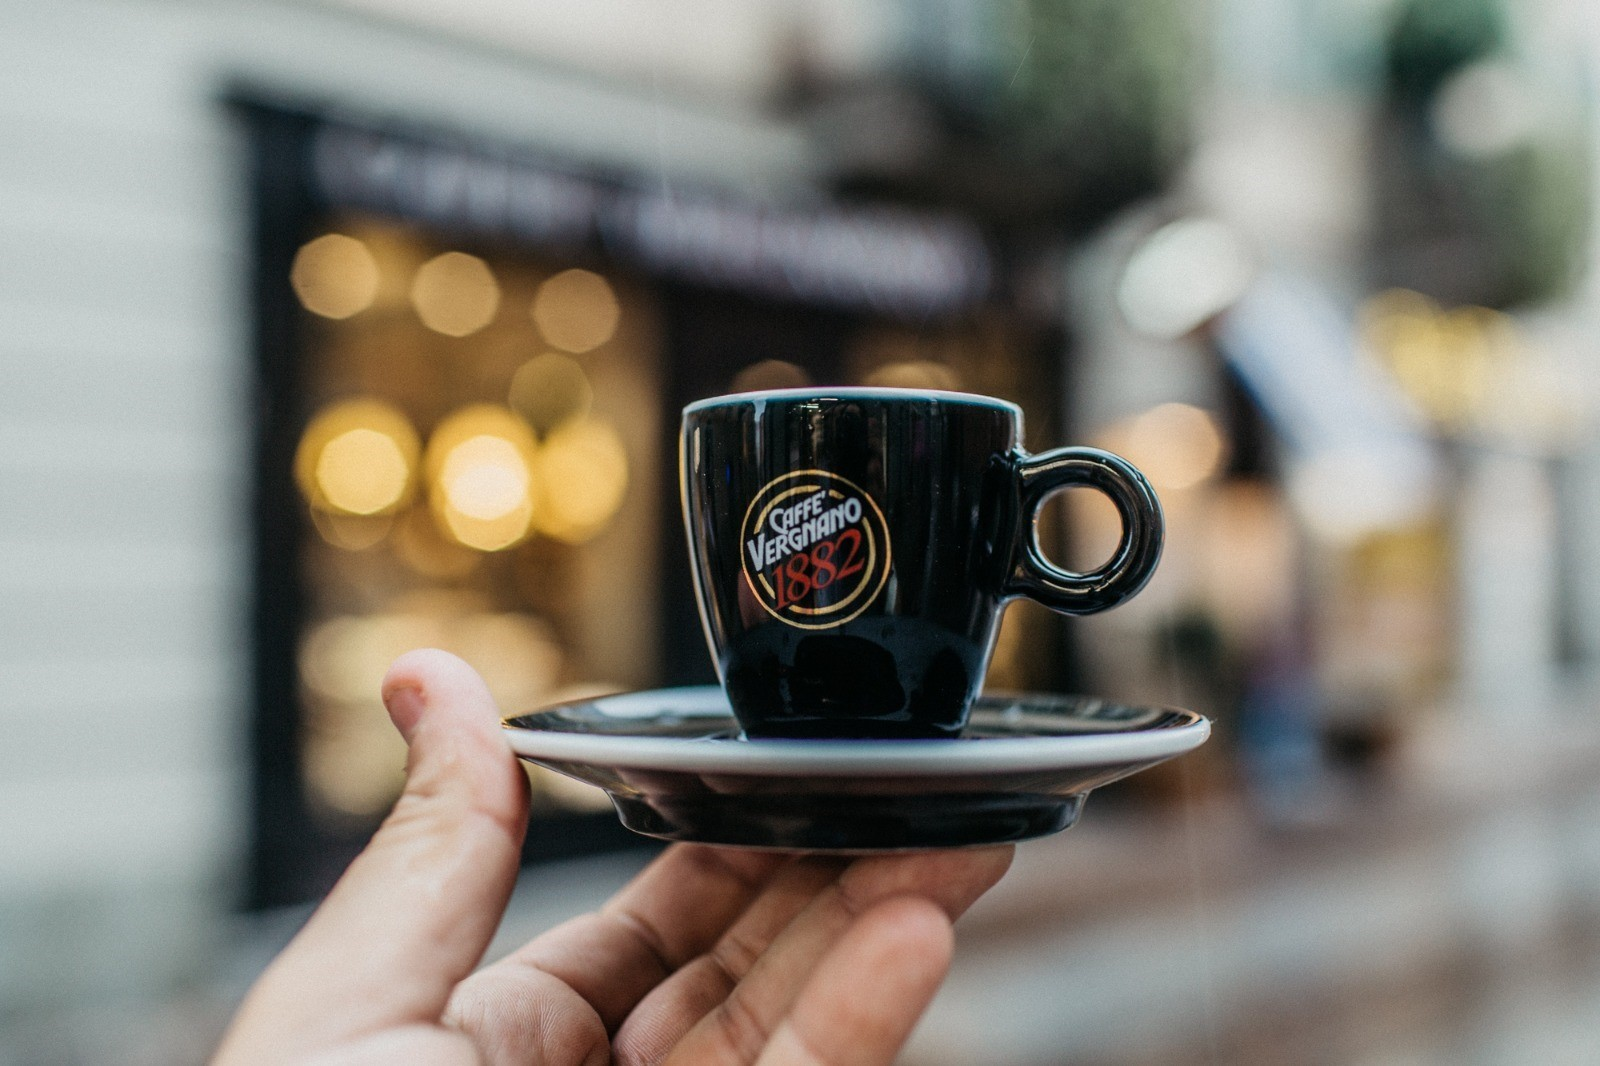 vrai café napolitain